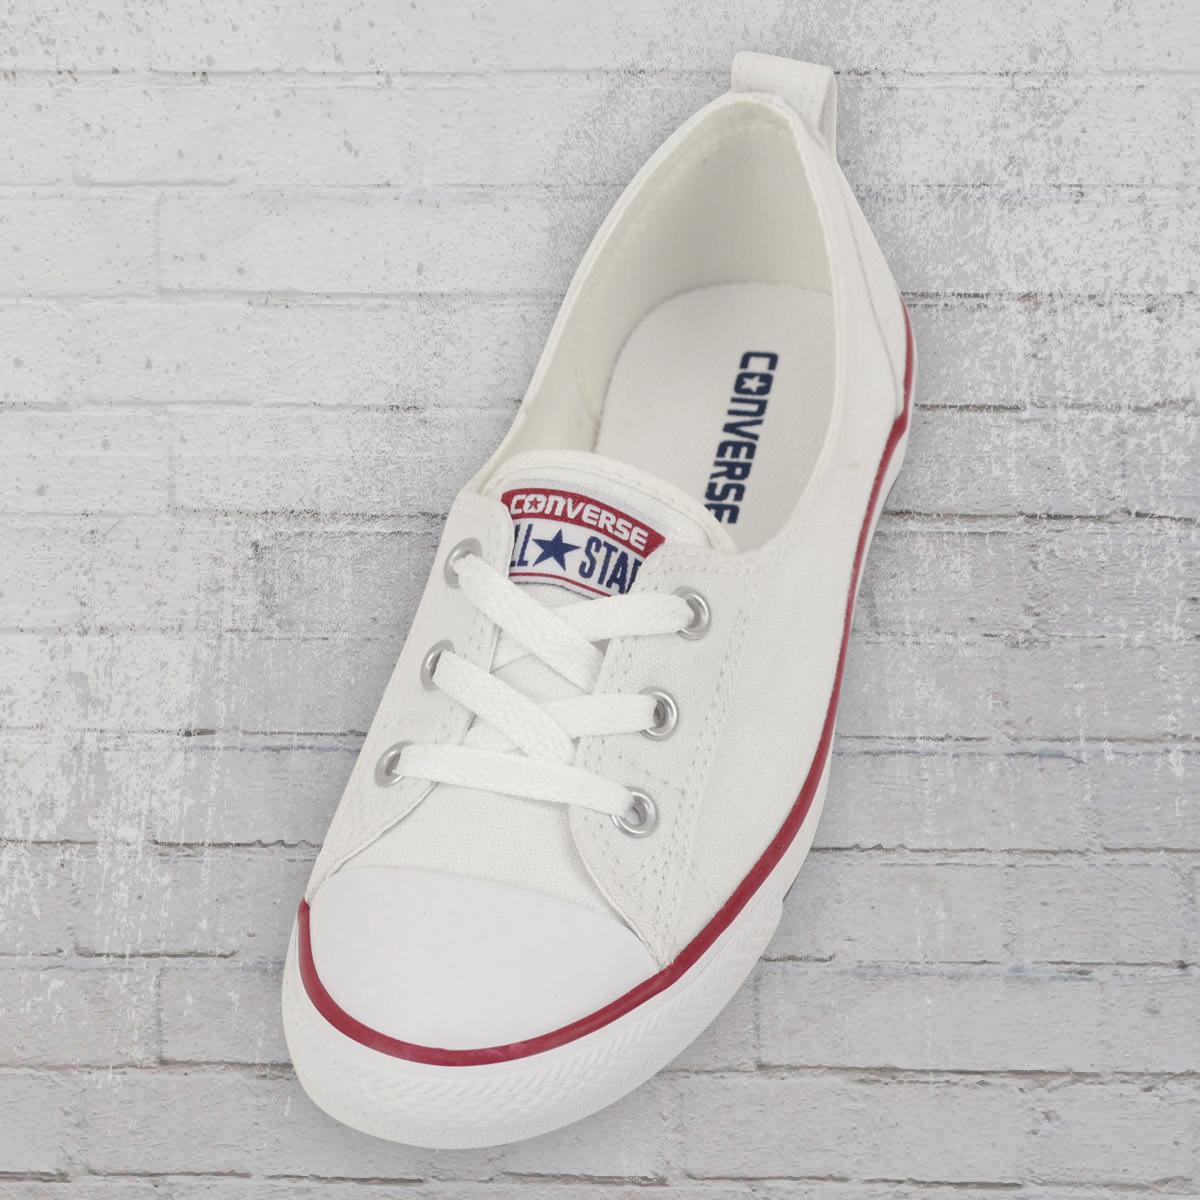 3288359e3dd4 Converse Leather Chucks AS CT HI 157469 C Shoes bone white